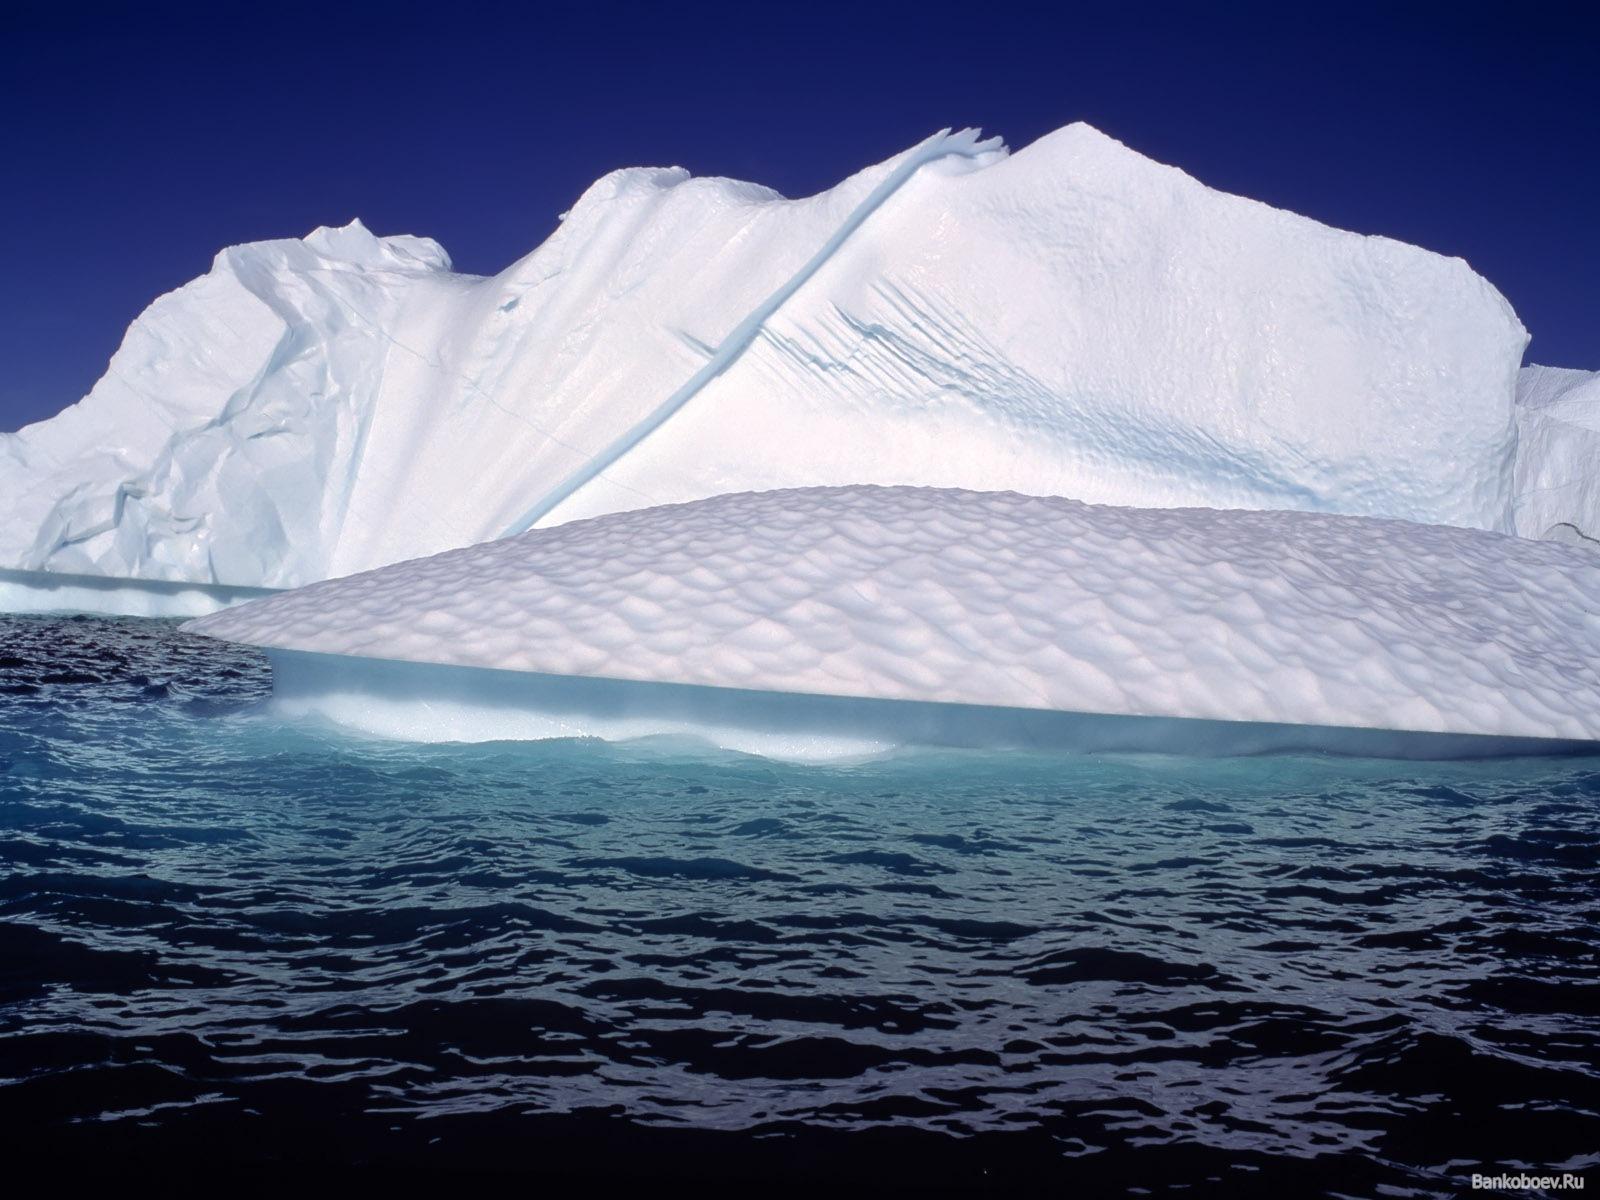 Wallpaper ไหนว่าปีนี้จะหนาวสุดในรอบ 30 ปี 50 Pic 185138-melisenta